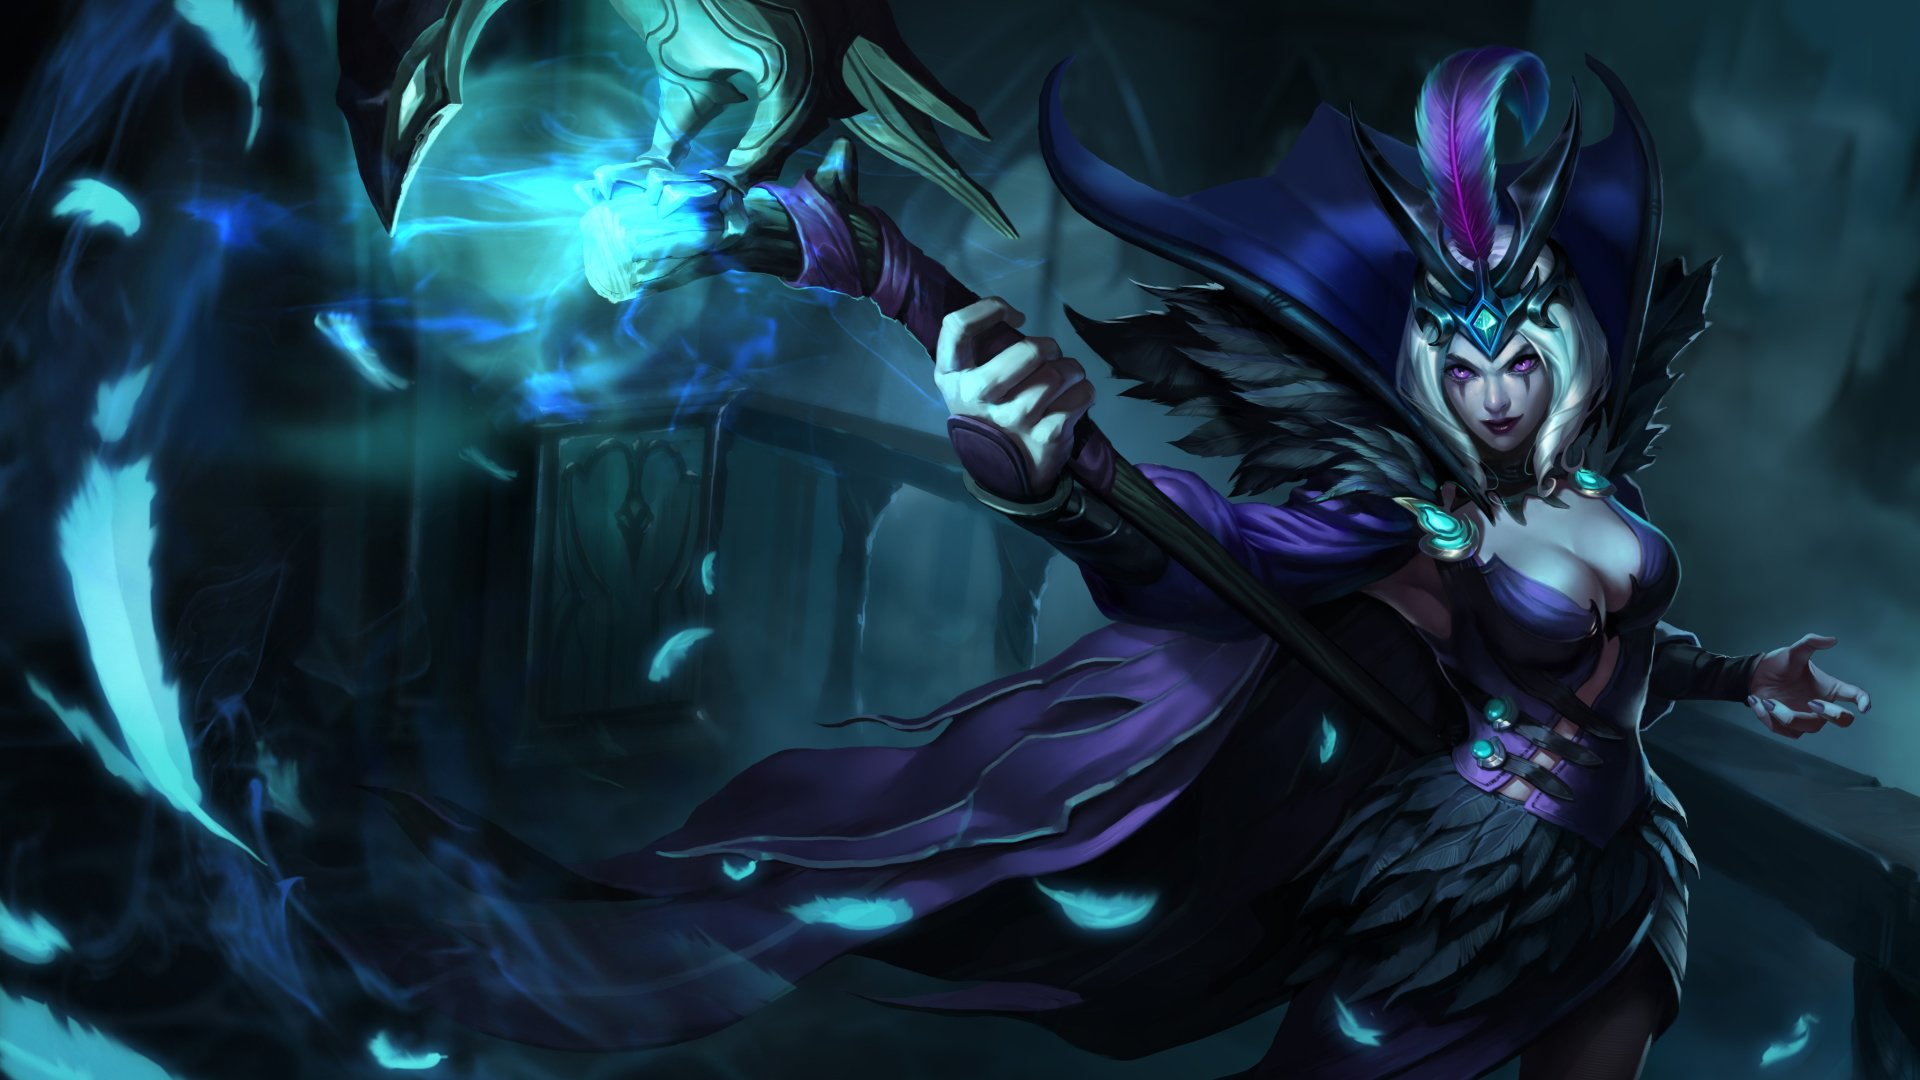 Video Game - League Of Legends  LeBlanc (League Of Legends) Purple Eyes Fantasy Woman Warrior Woman Warrior Blue Cape Feather Wallpaper